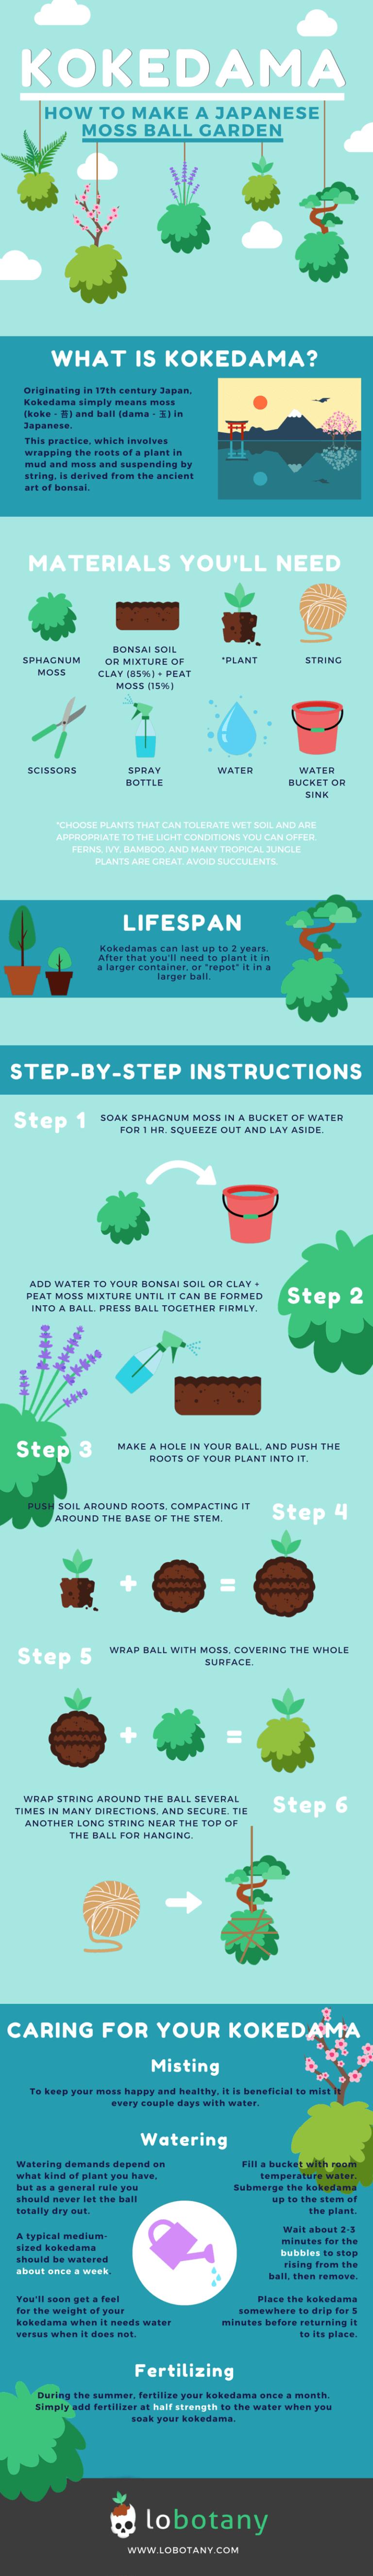 Kokedama how to make a japanese moss ball garden gardening